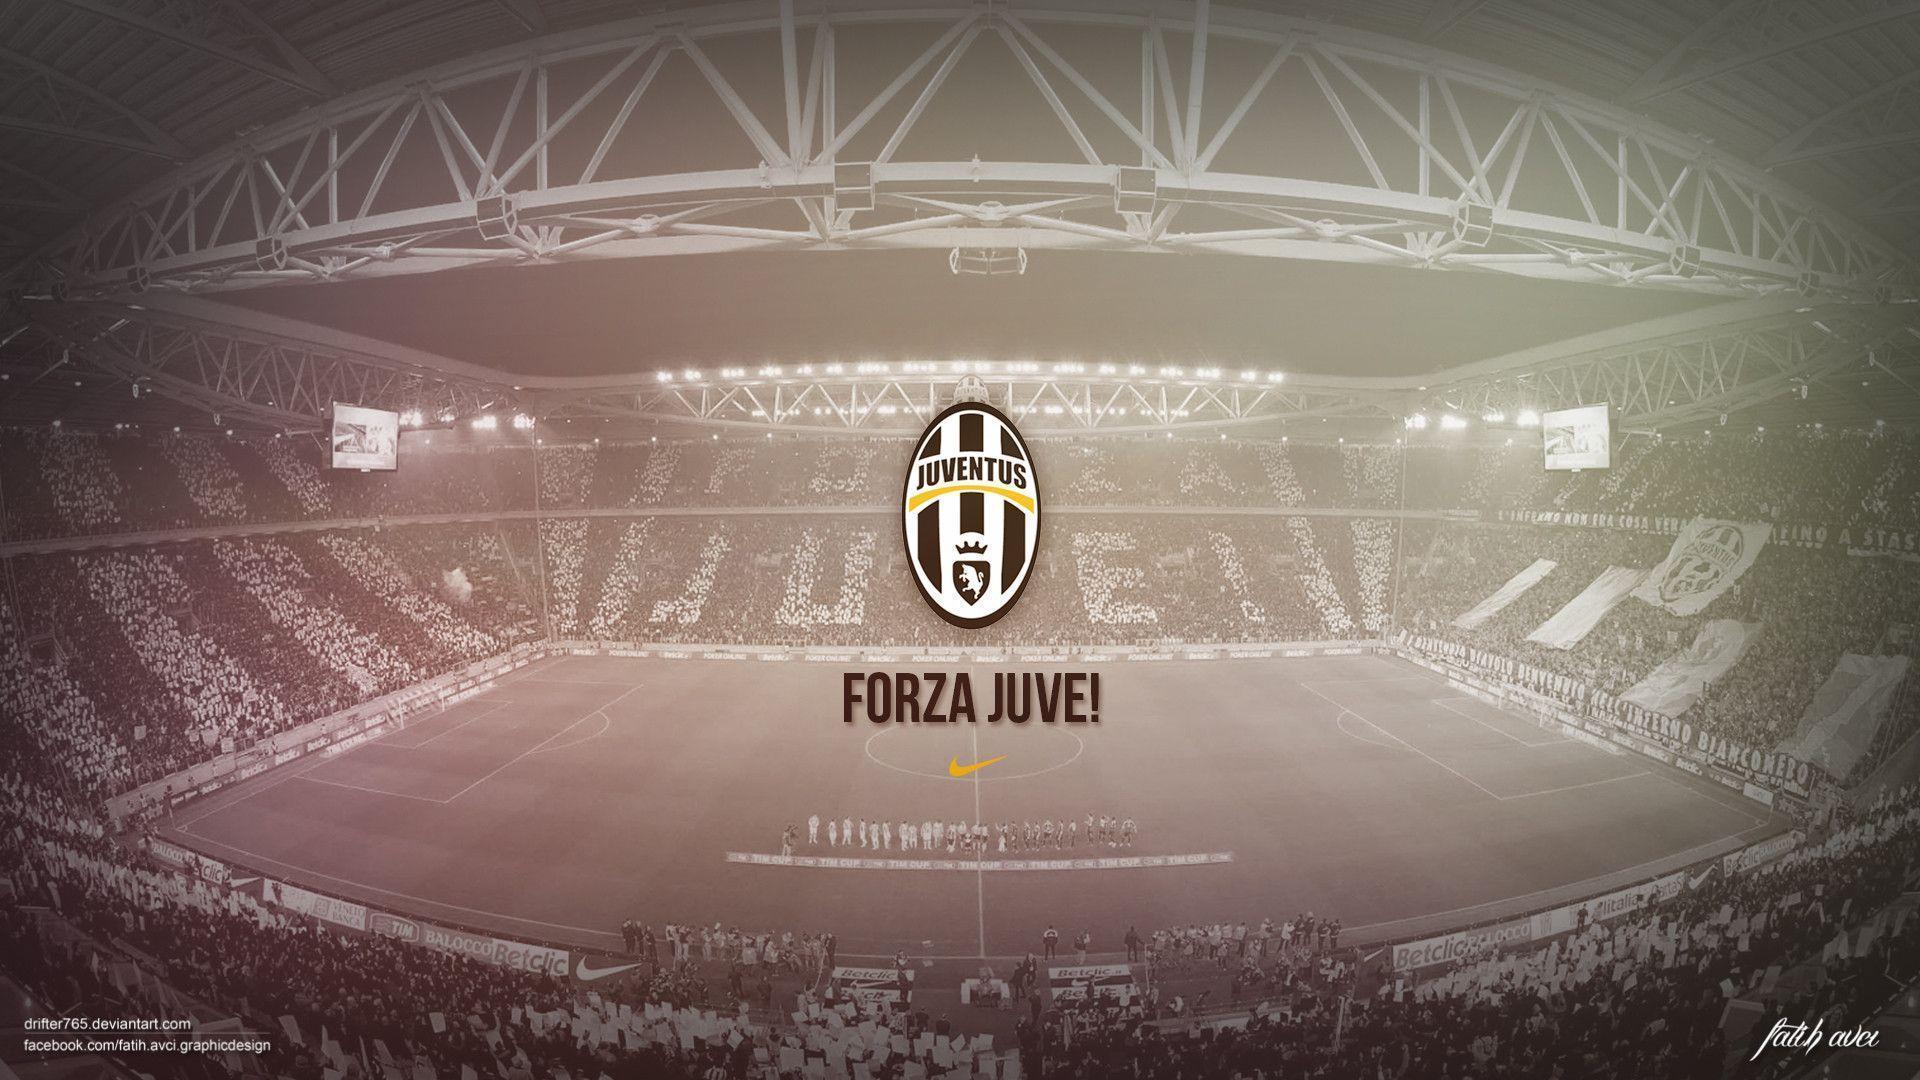 Juventus hd wallpapers wallpaper cave - Forza logo wallpaper ...